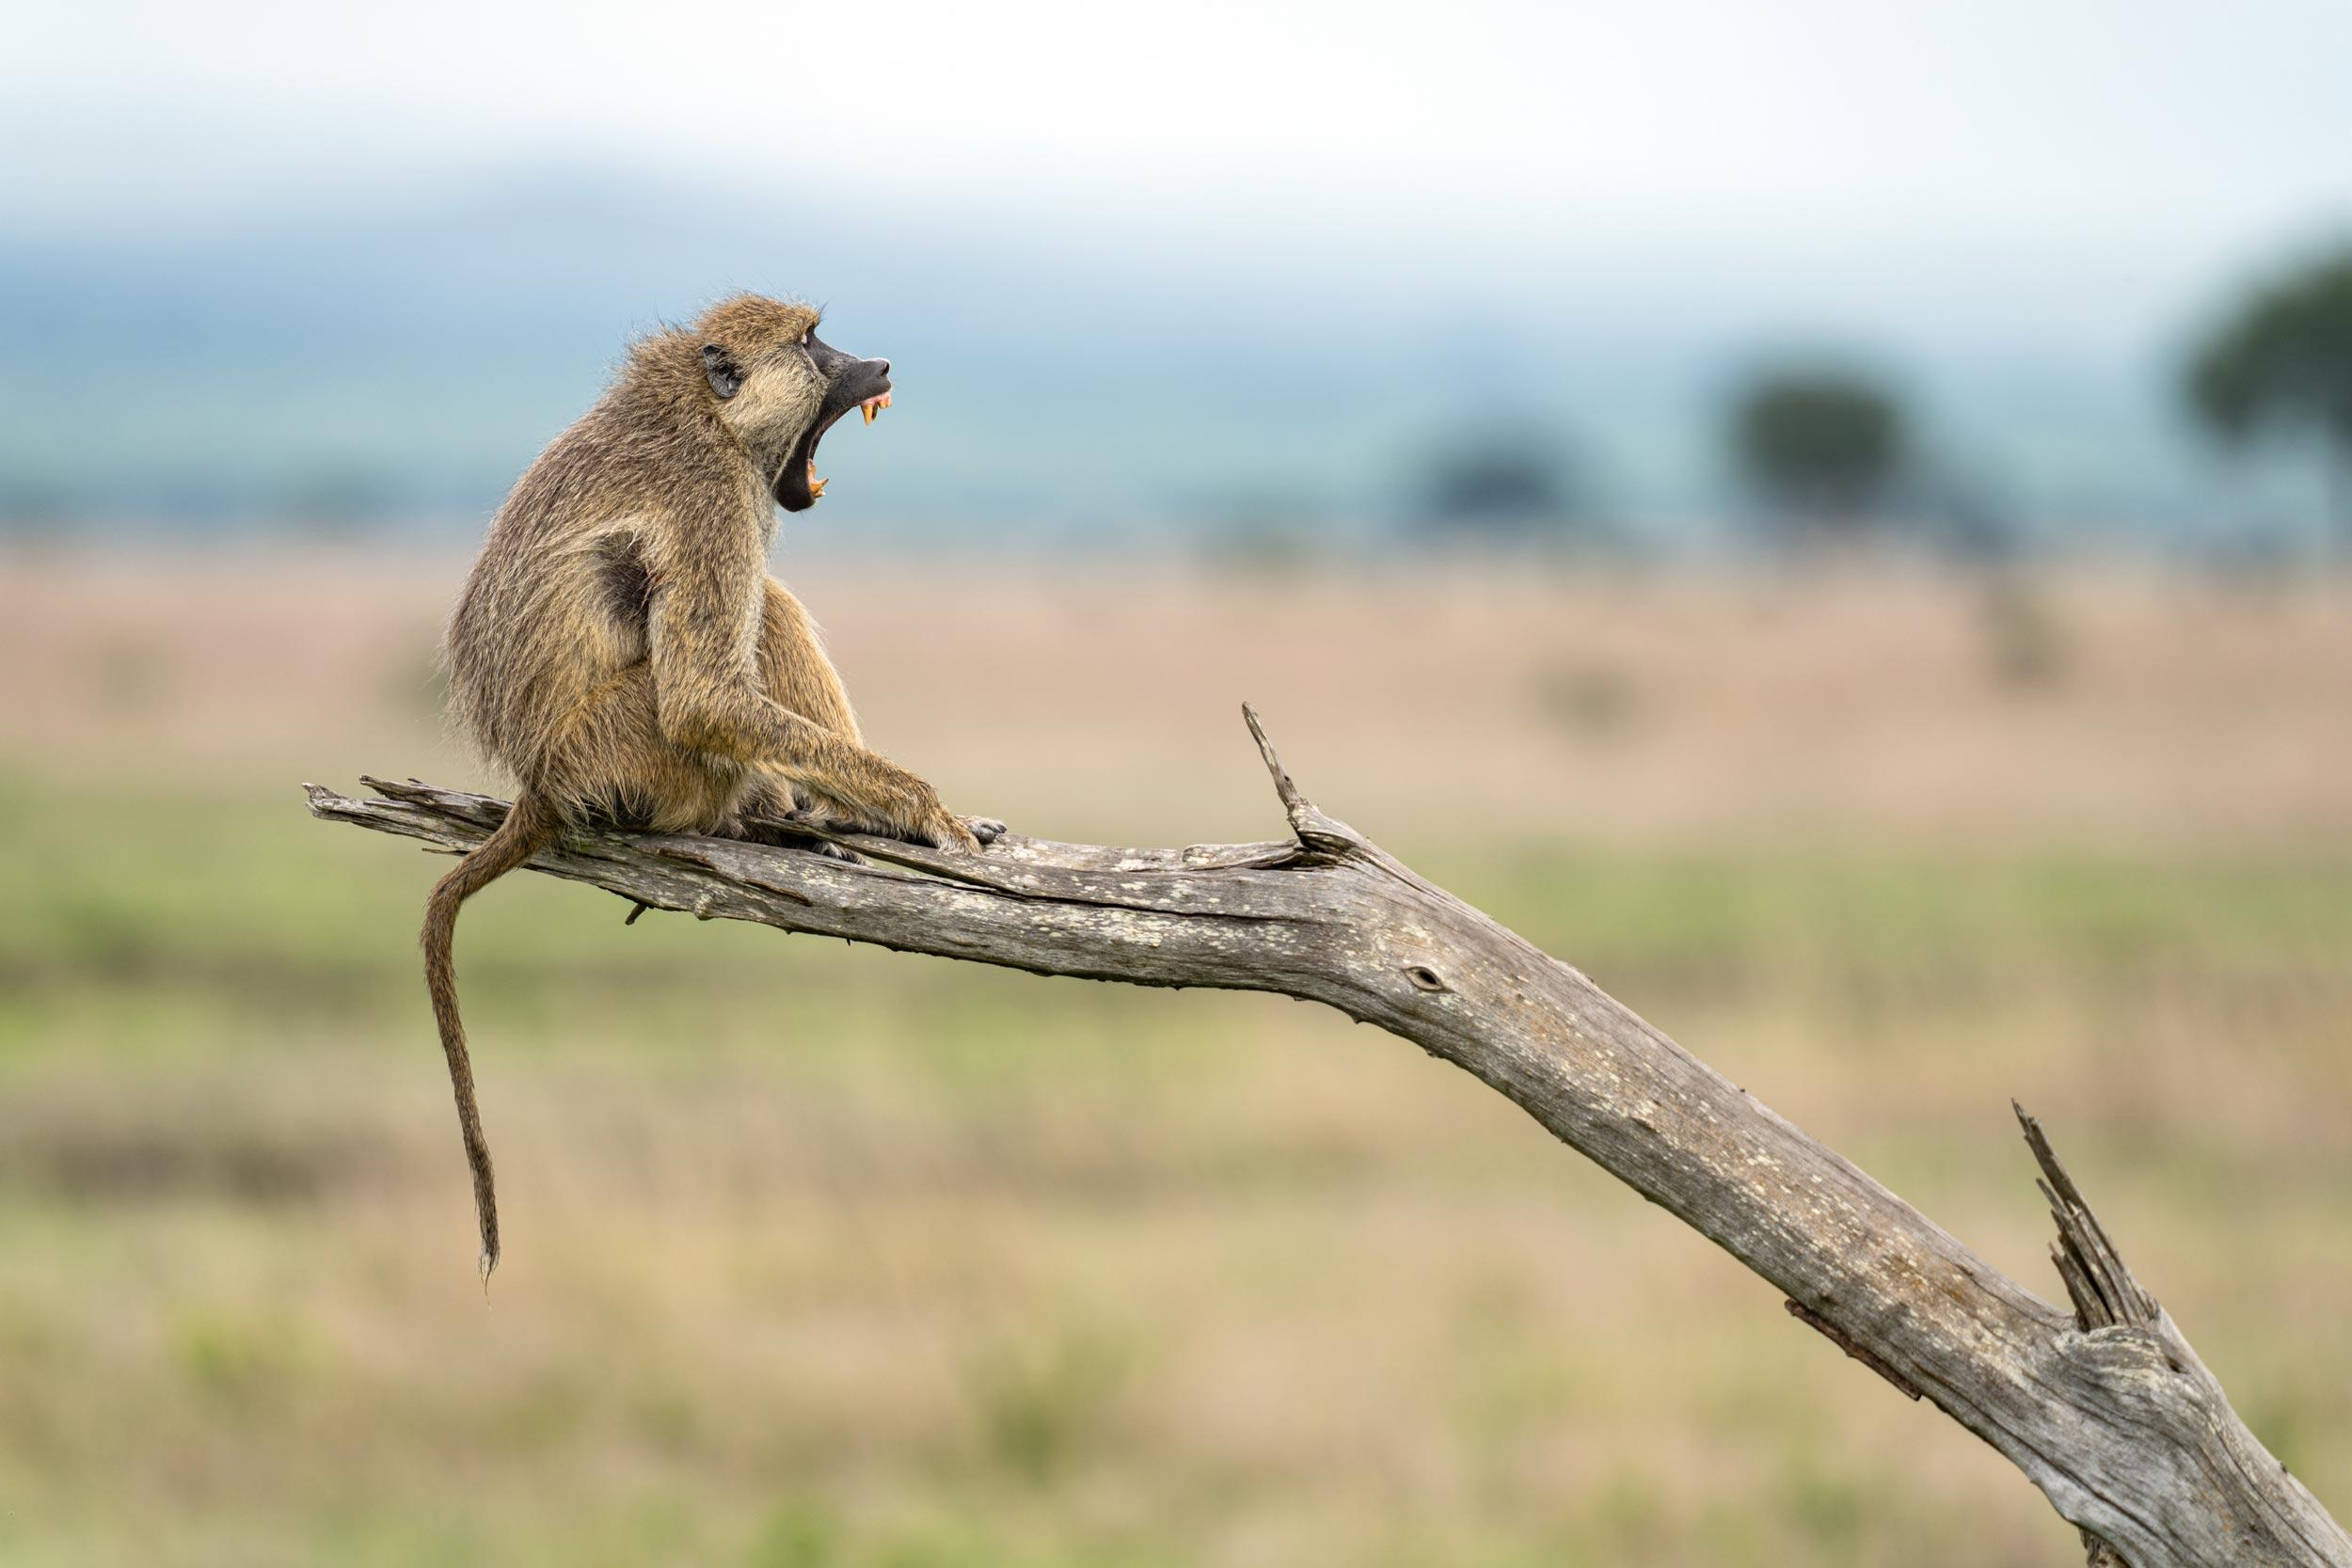 Baboon photographed in Mikumi nationalpark, Tanzania